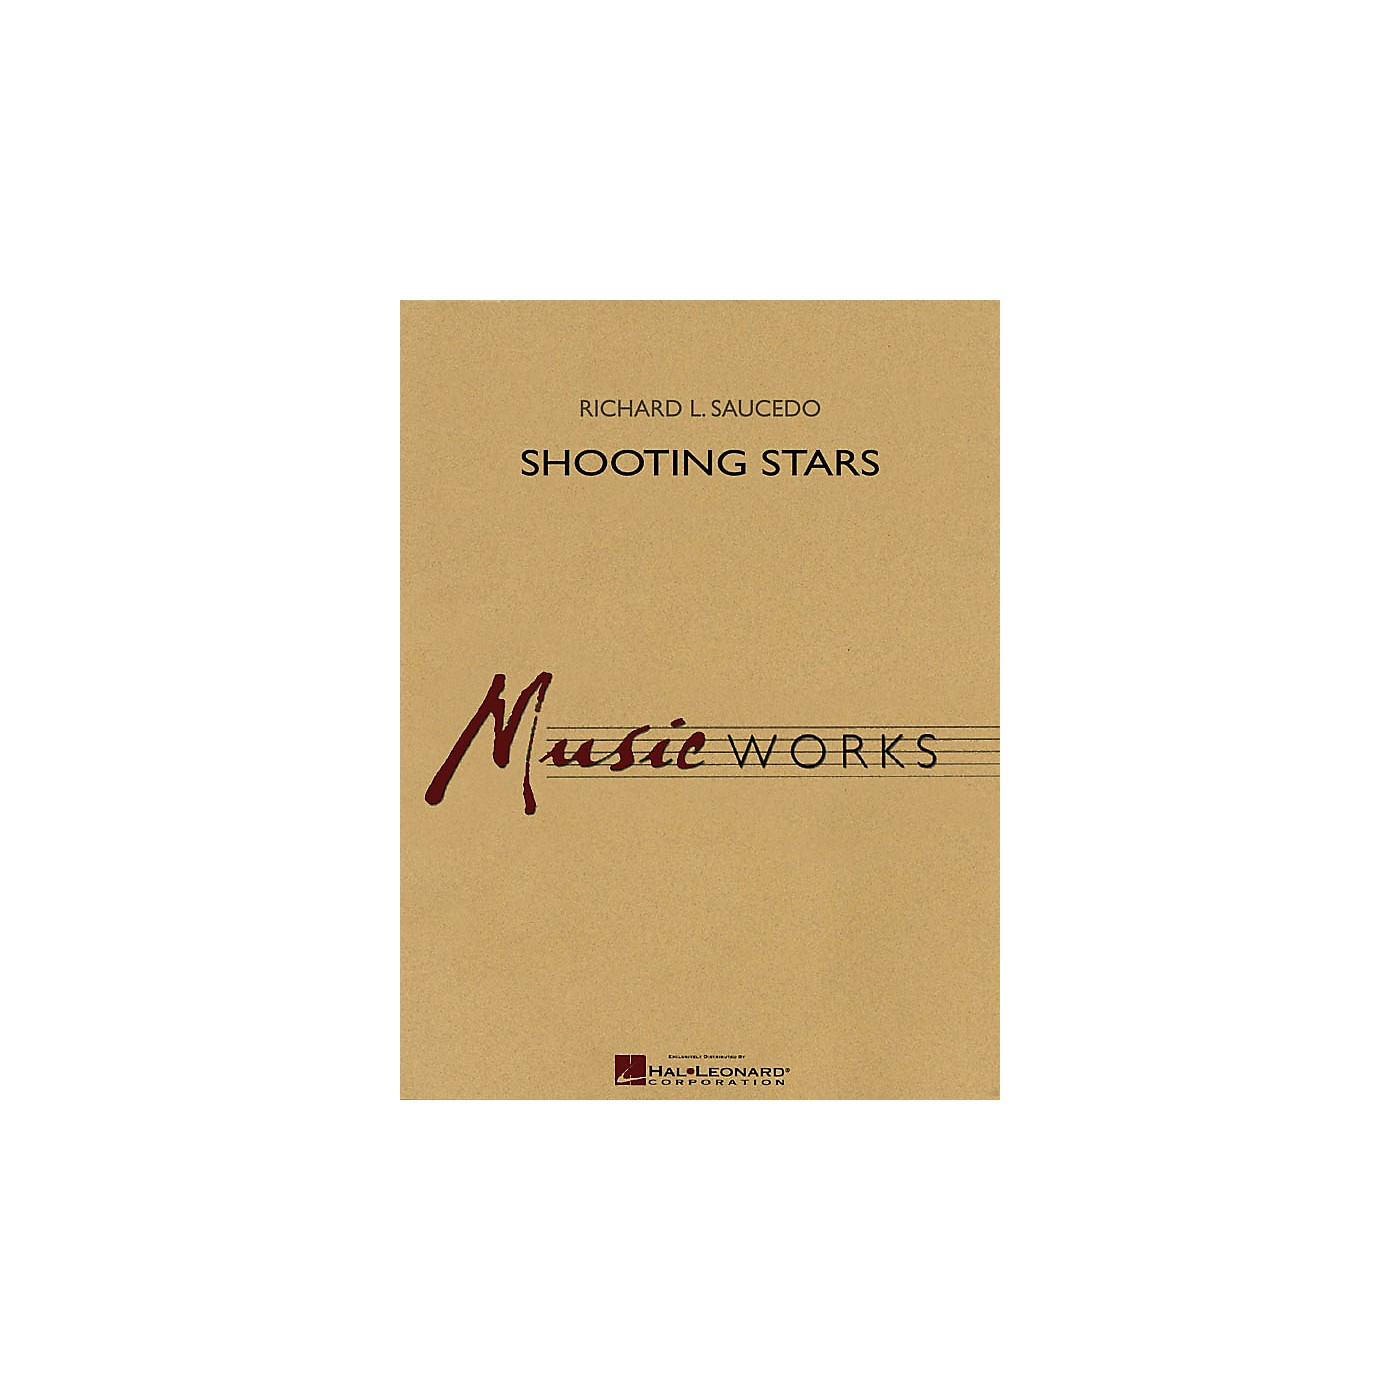 Hal Leonard Shooting Stars Concert Band Level 5 Composed by Richard L. Saucedo thumbnail